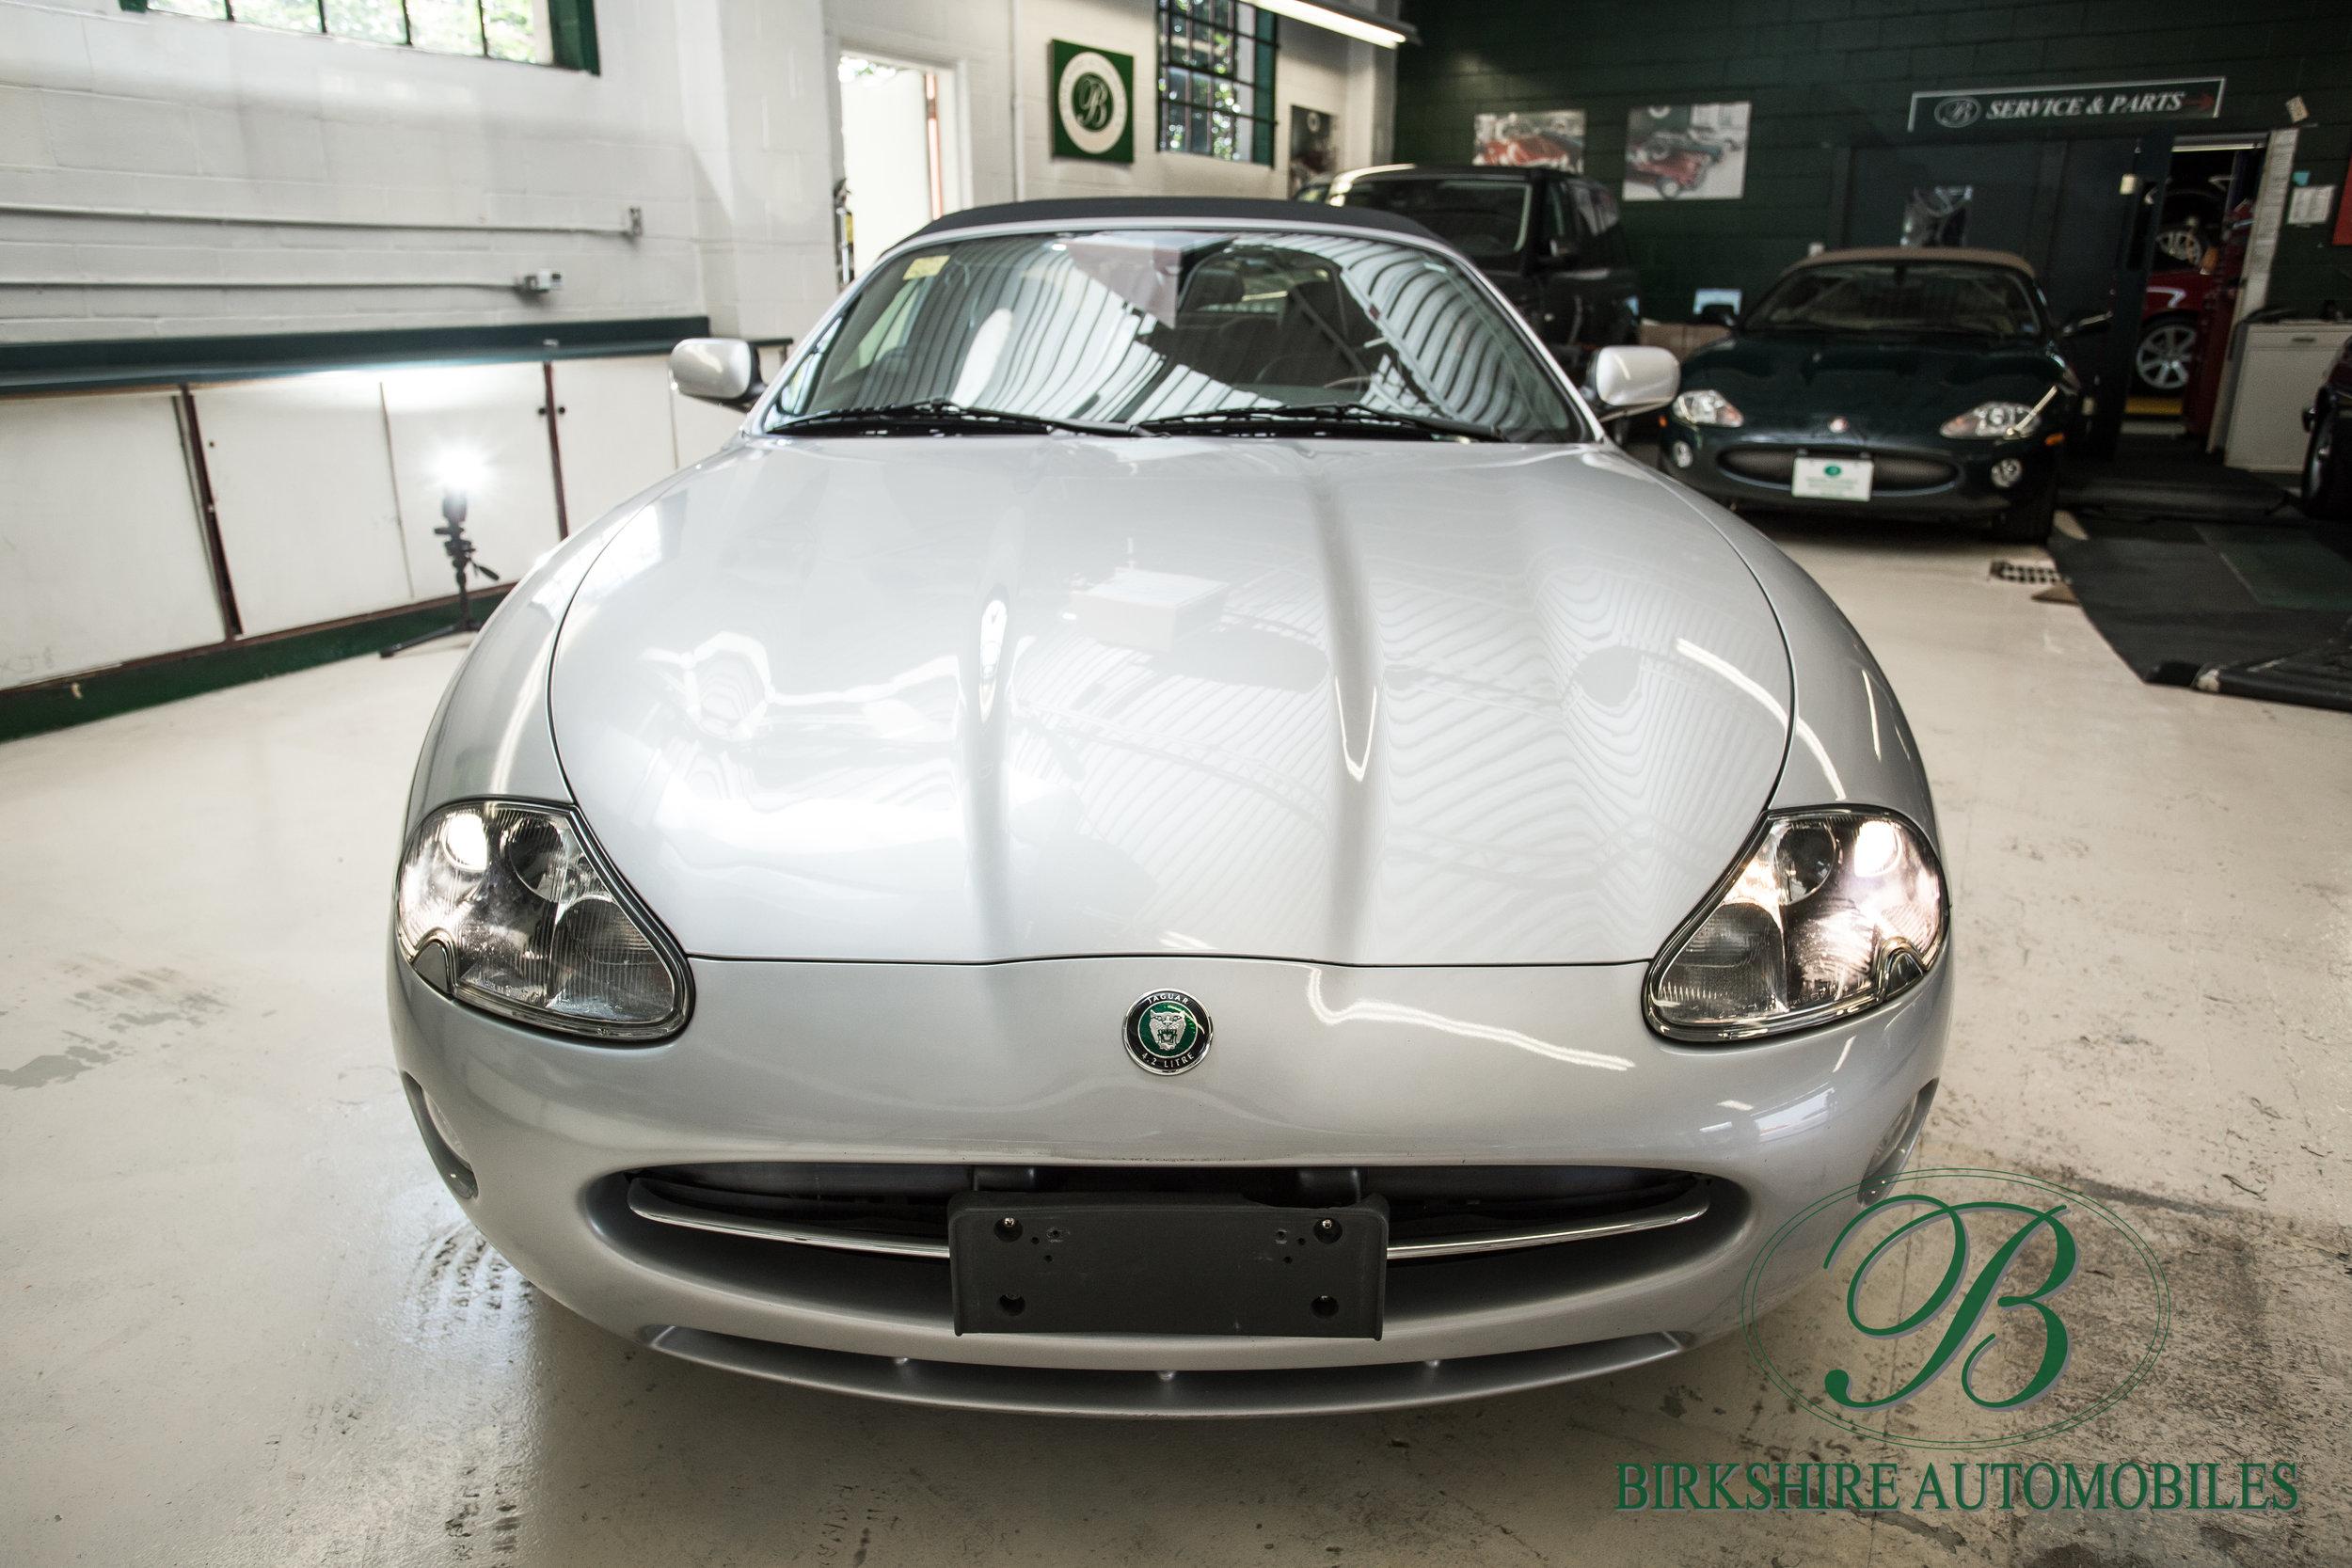 Birkshire Automobiles-216.jpg